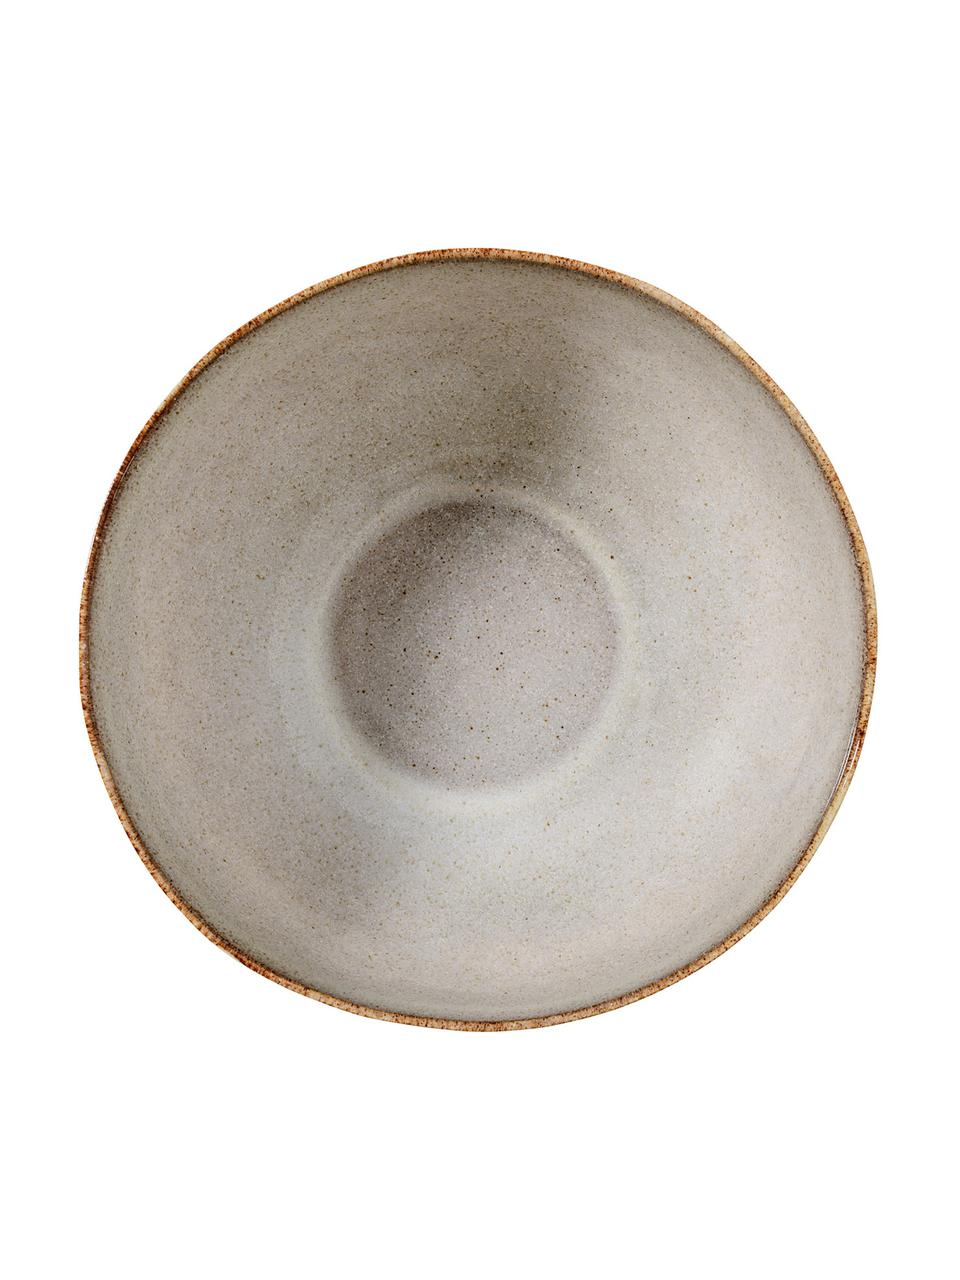 Handgemaakte kommen Sandrine in beige, 6 stuks, Keramiek, Lichtgrijs, Ø 15 x H 8 cm